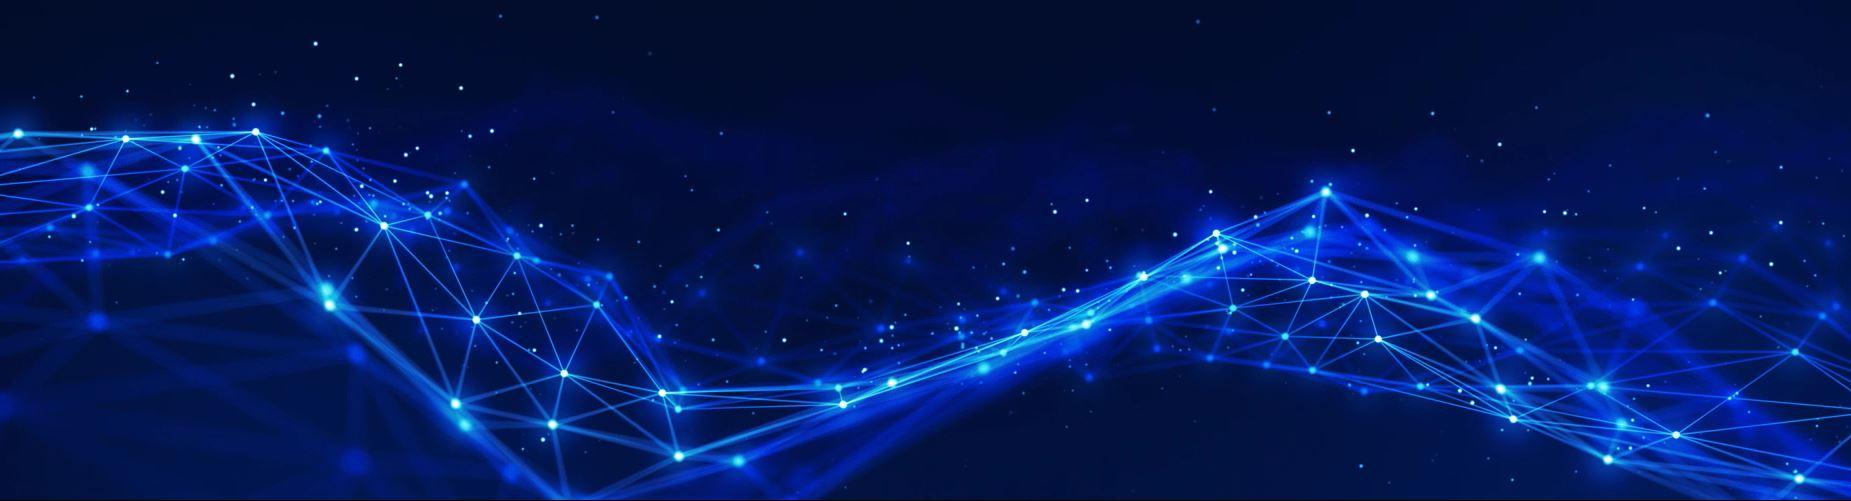 Digital network grid blue